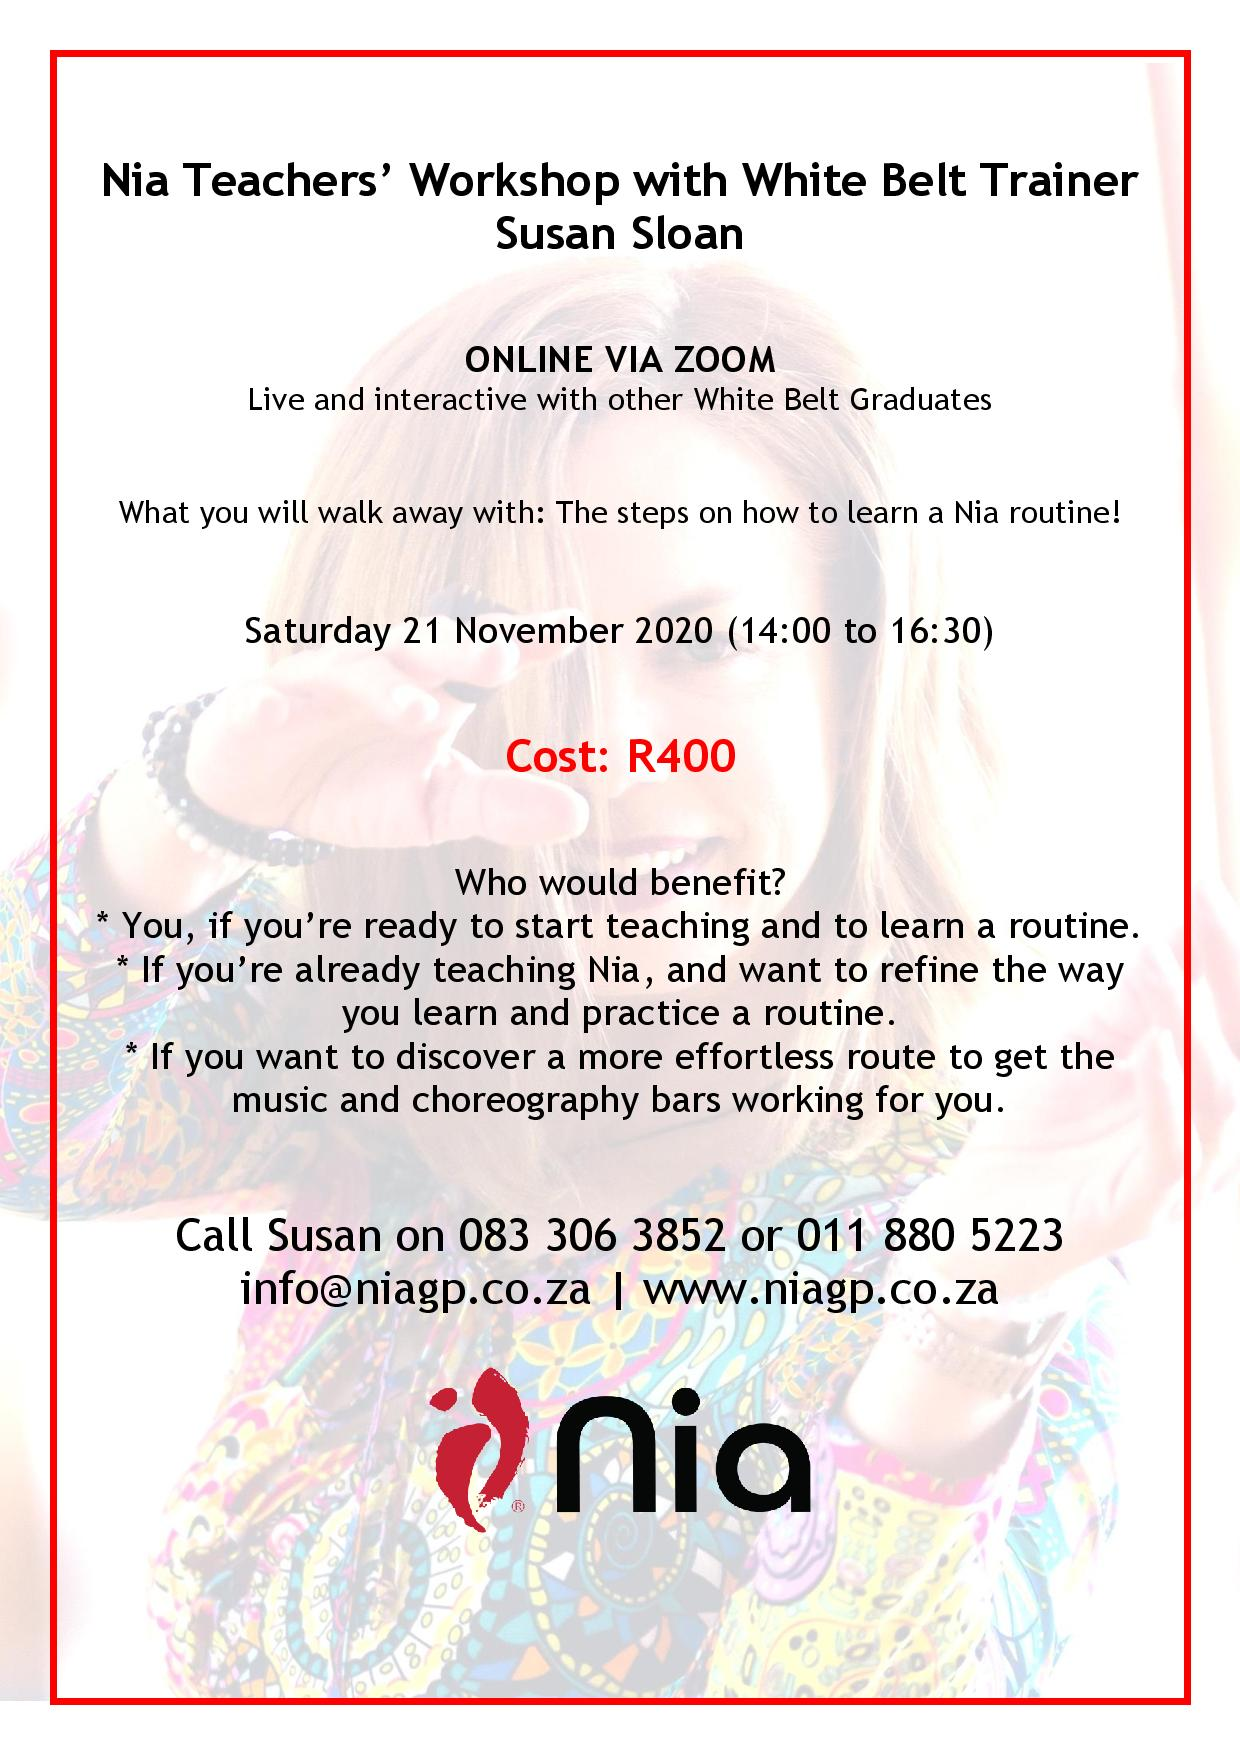 Nia teachers programme – November 2020